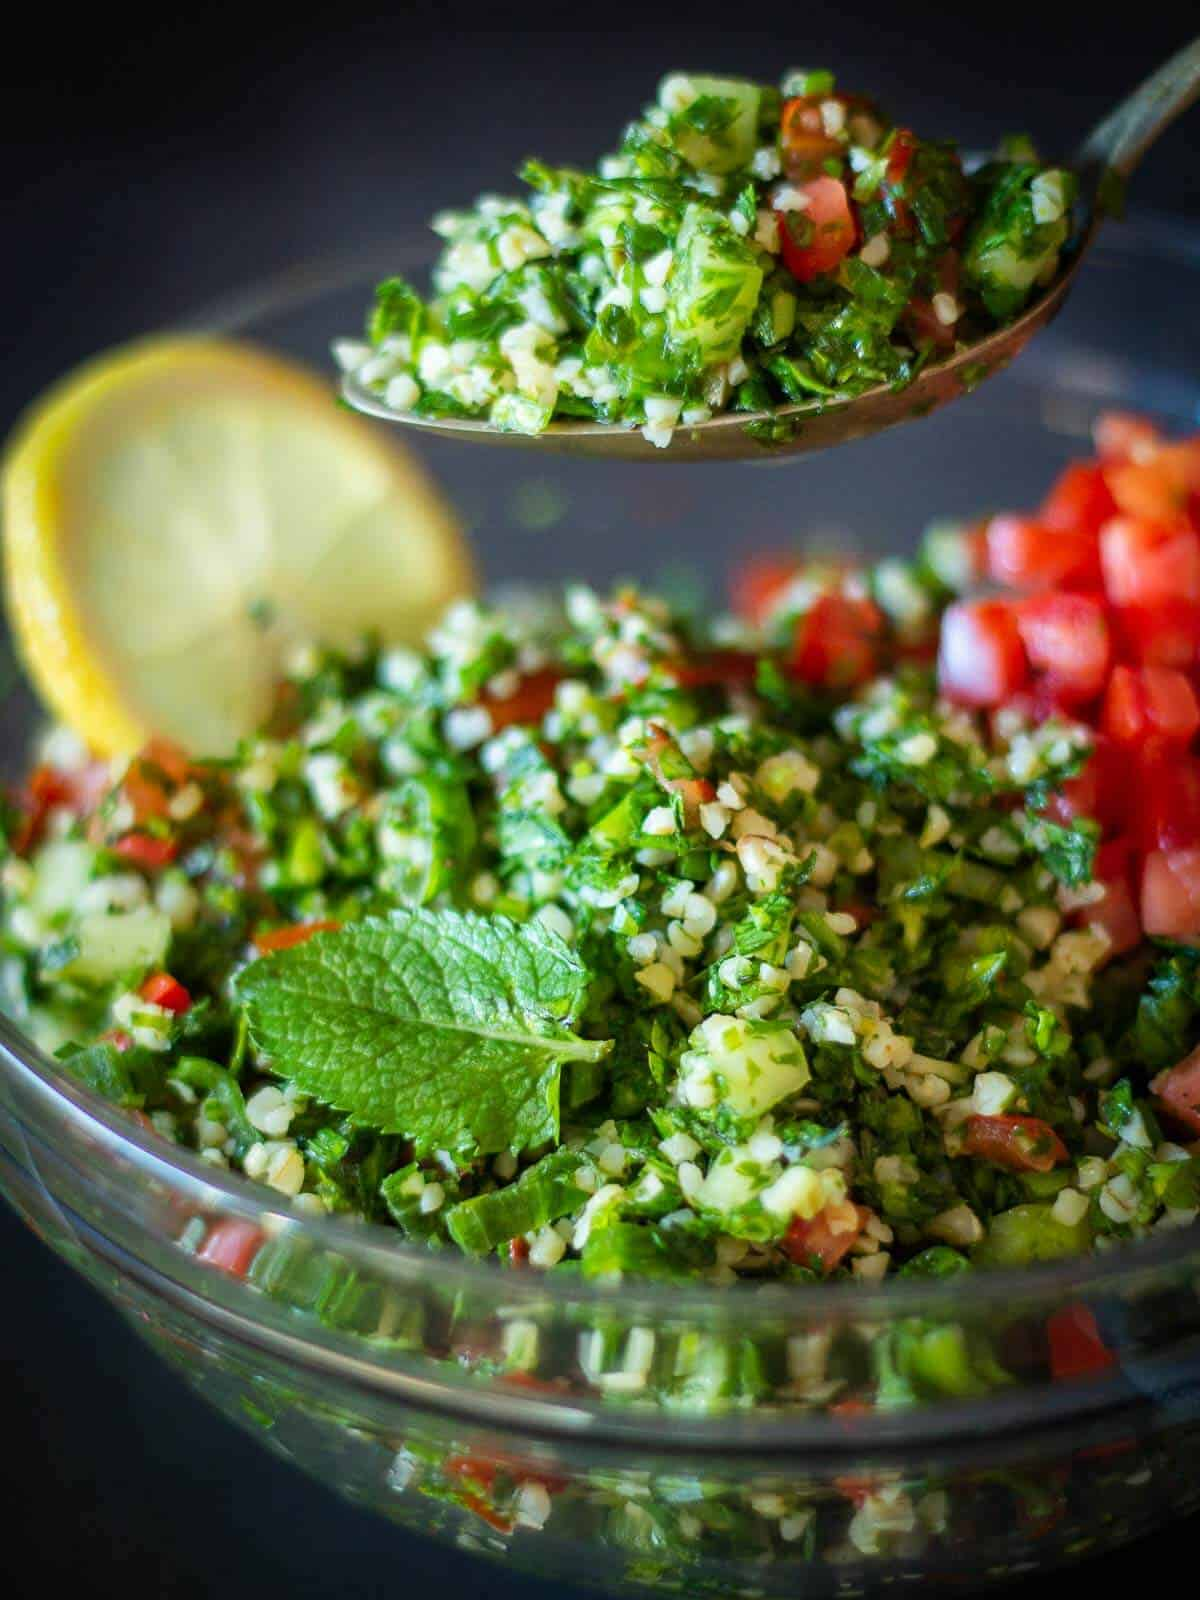 Spoon of Tabbouleh Salad